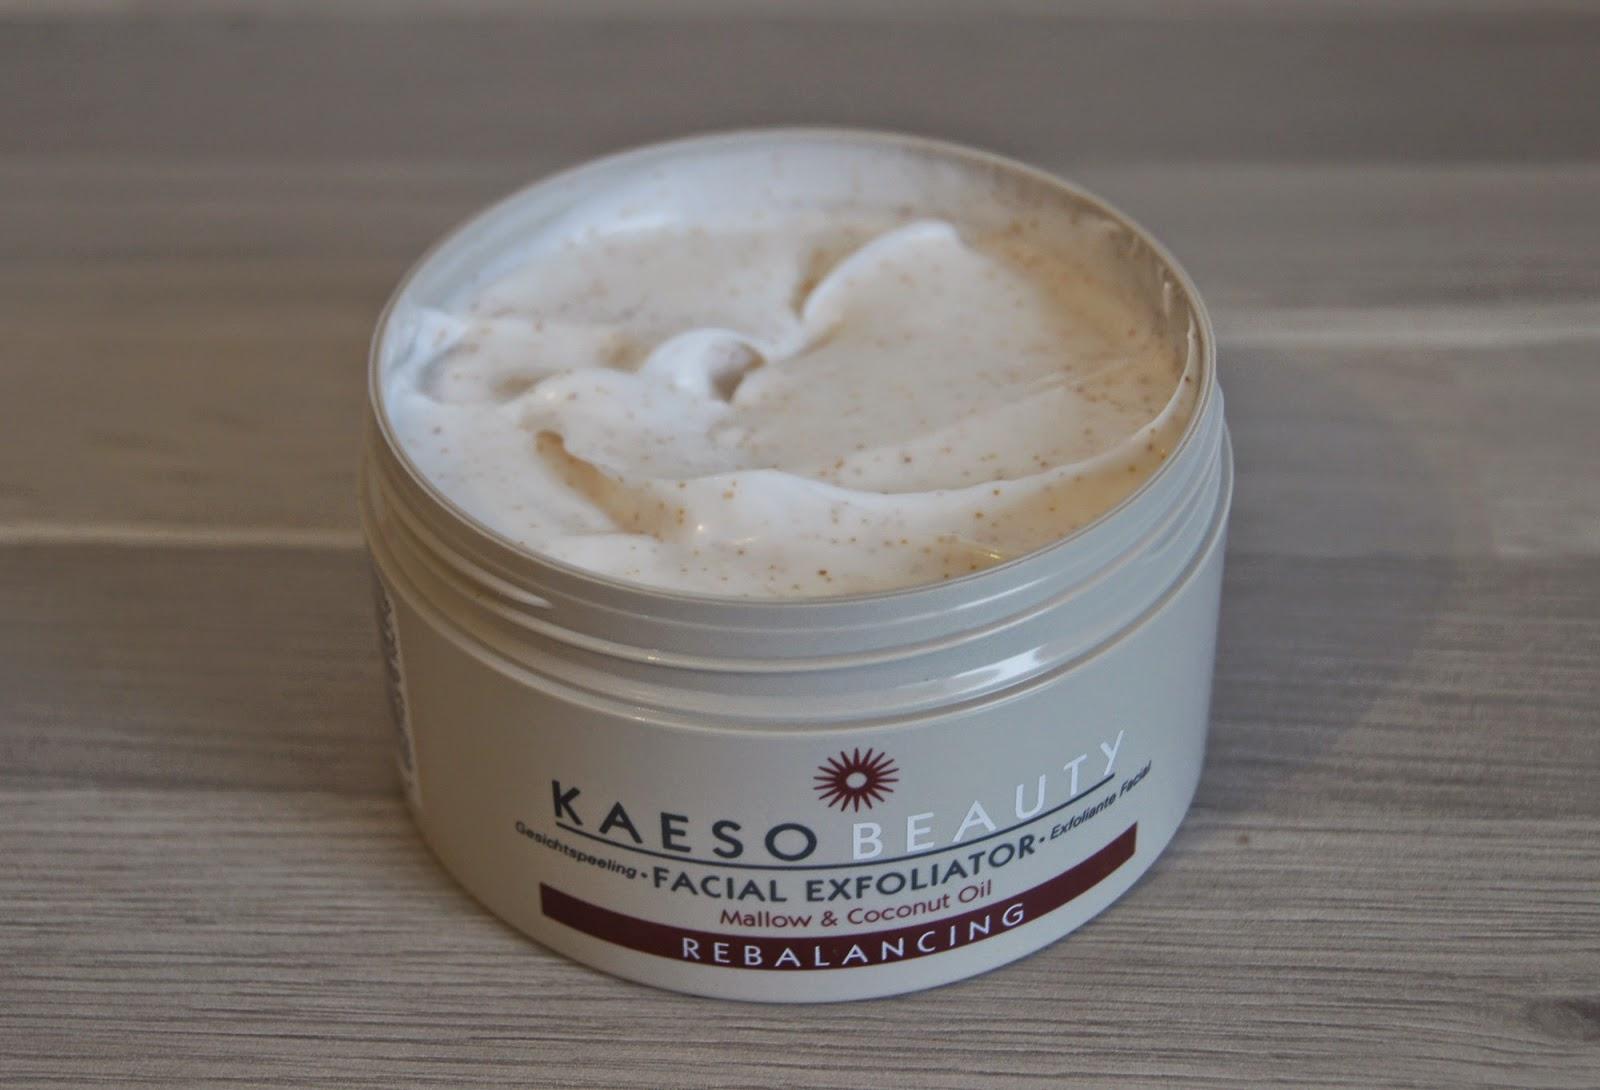 kaeso beauty exfoliator